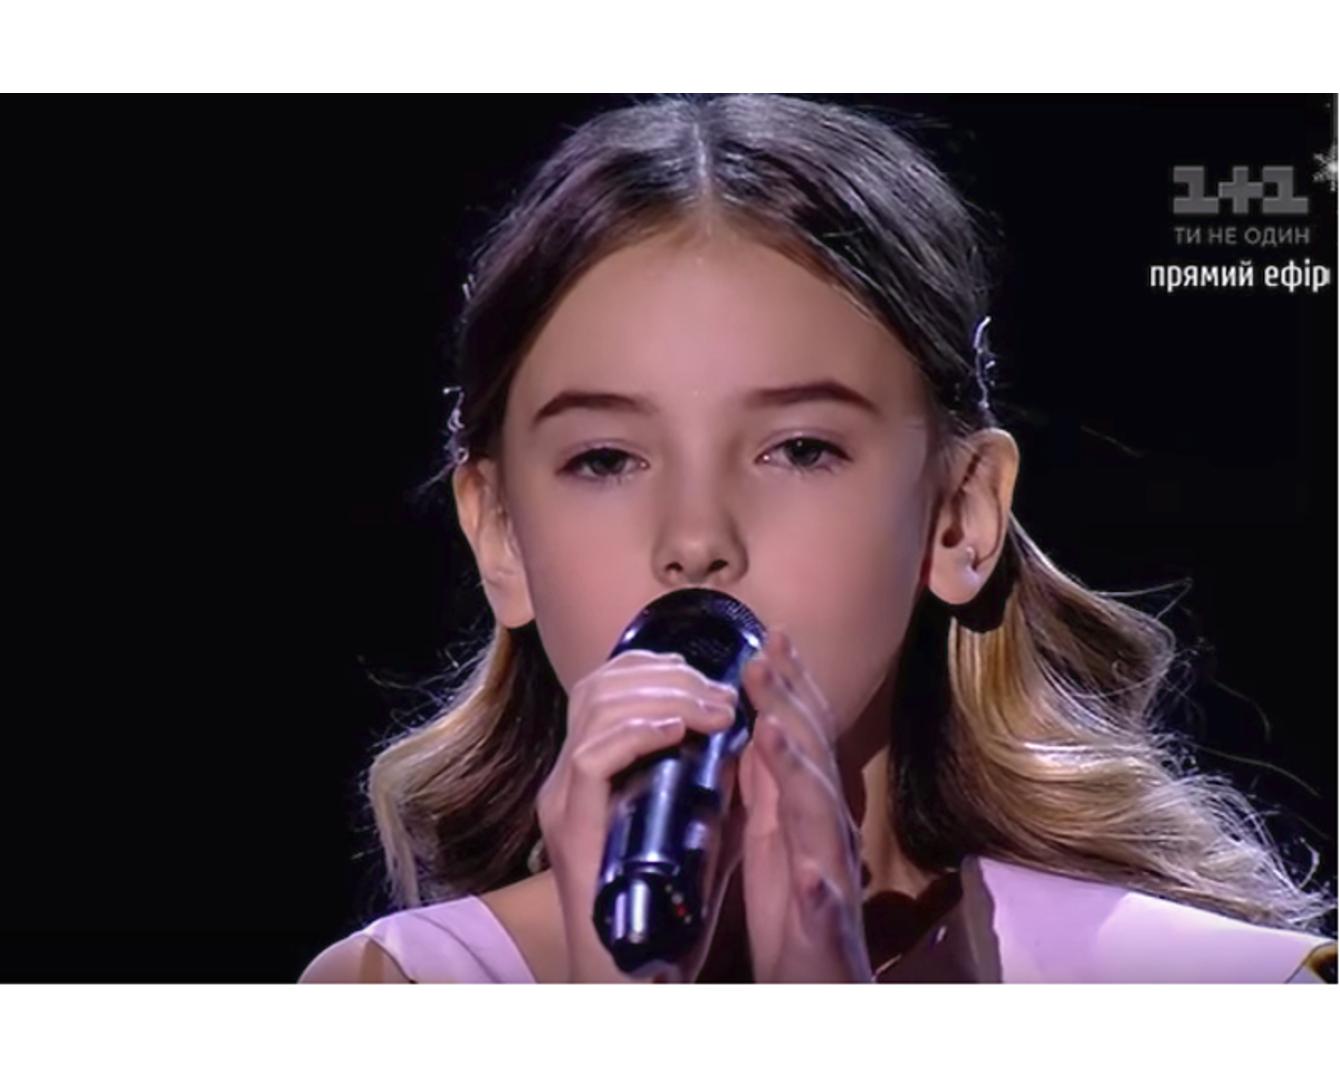 Данэлия Тулешова победила в конкурсе «Голос. Дiти»